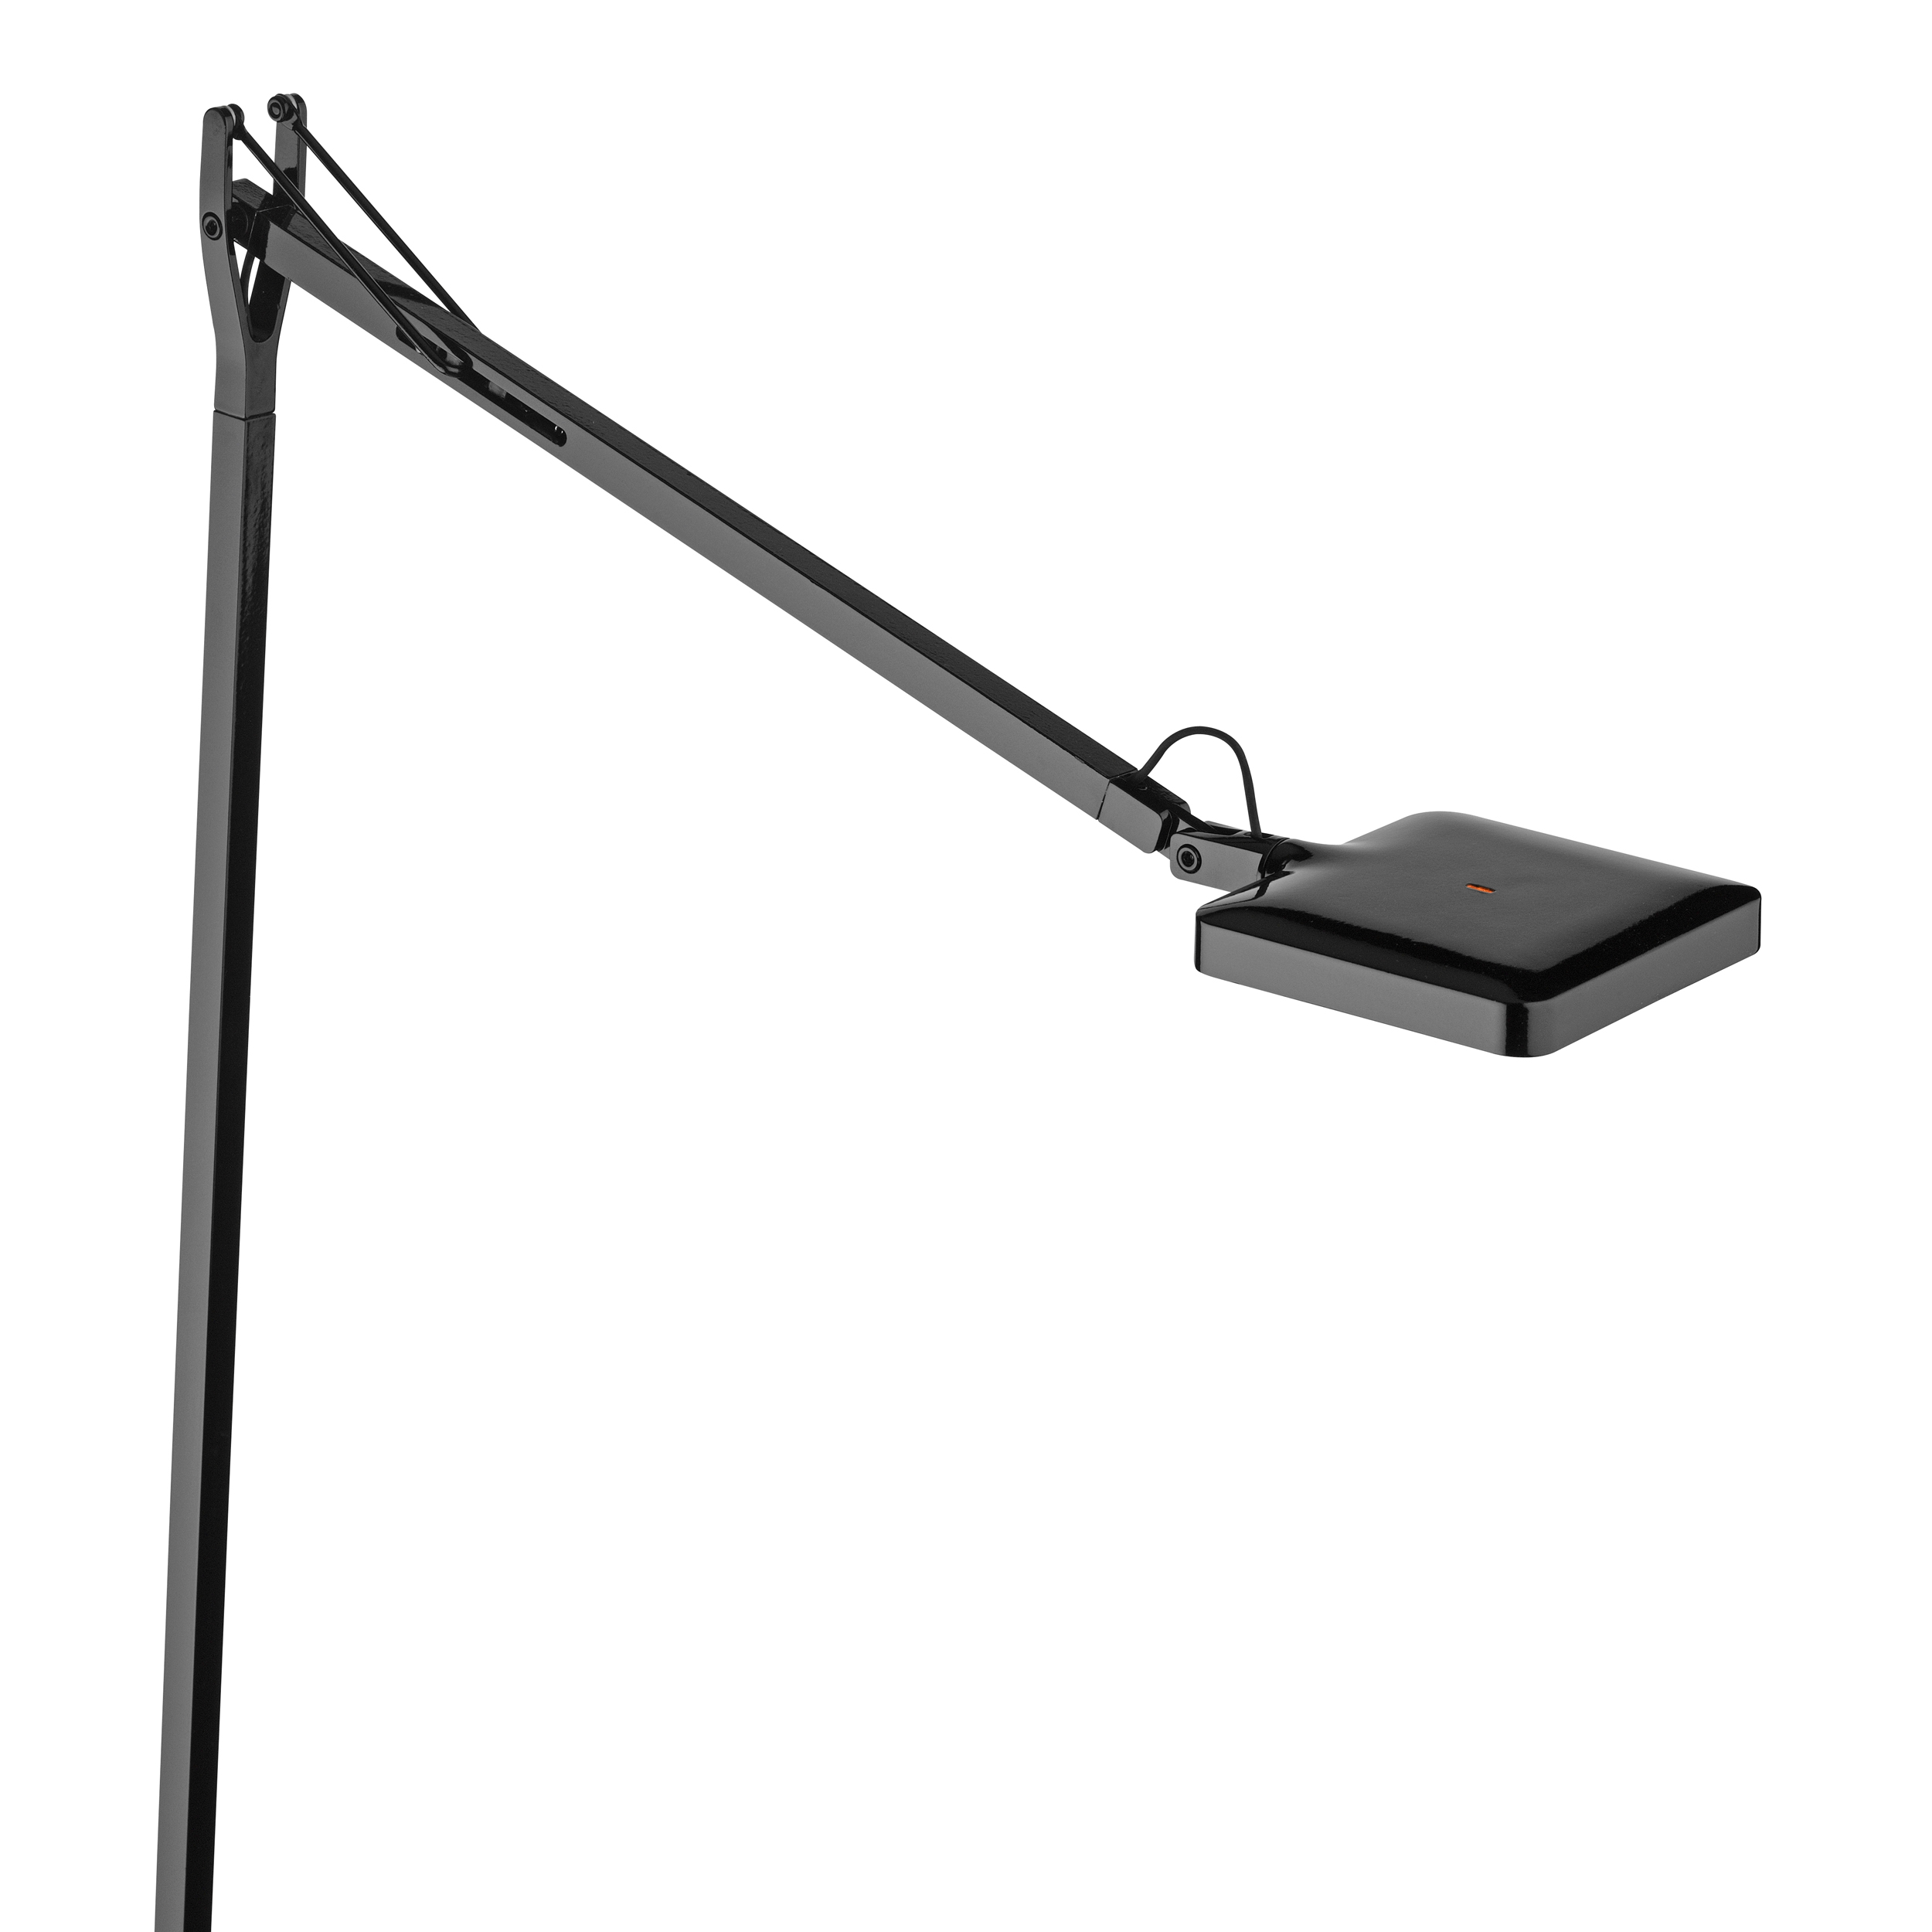 Kelvin LED Tischleuchte mit Klemme